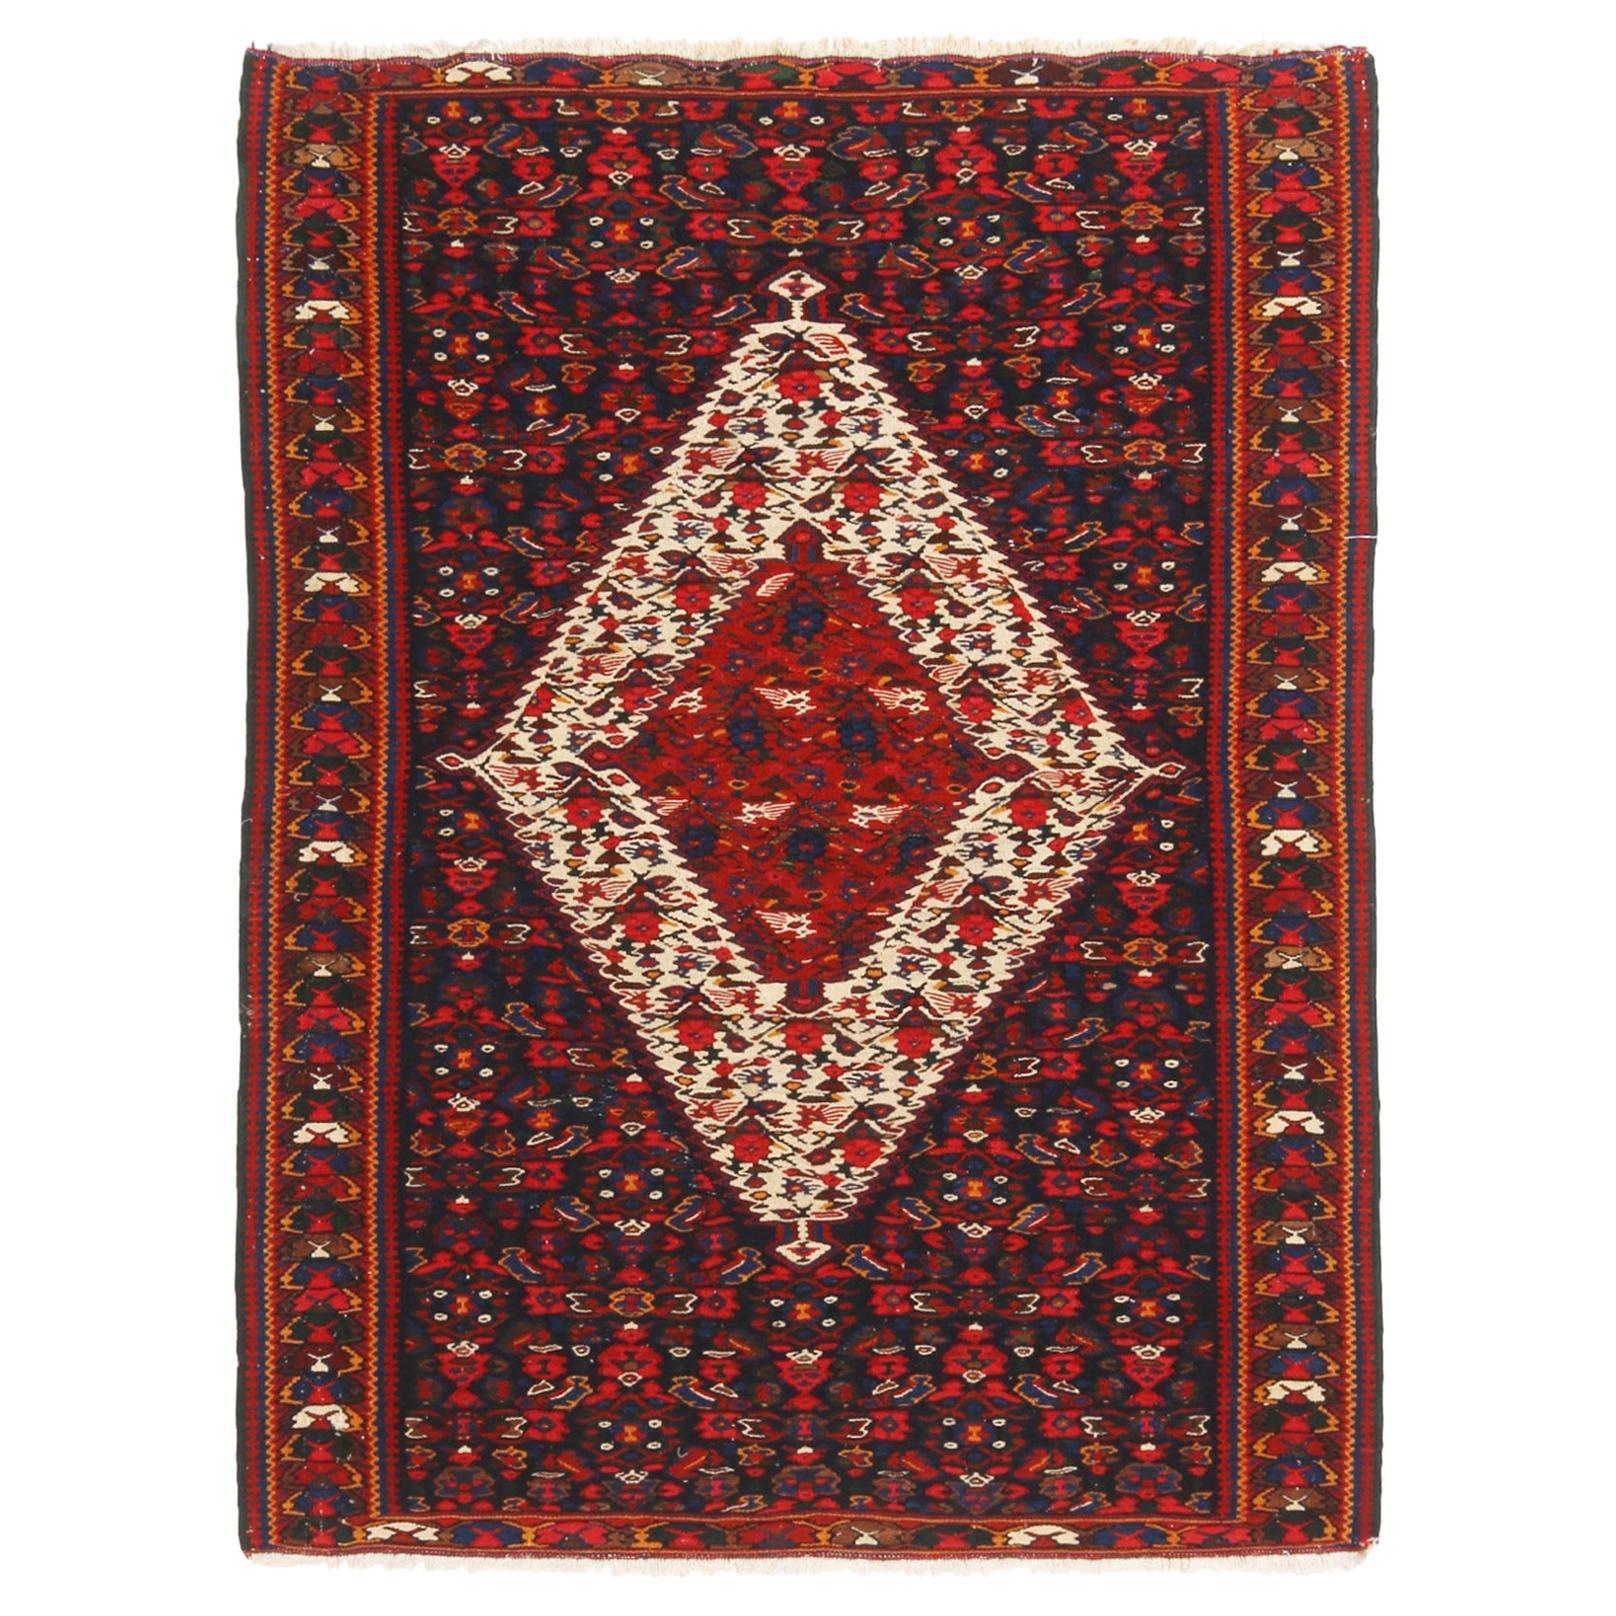 Vintage Senneh Transitional Red and Beige Wool Persian Kilim